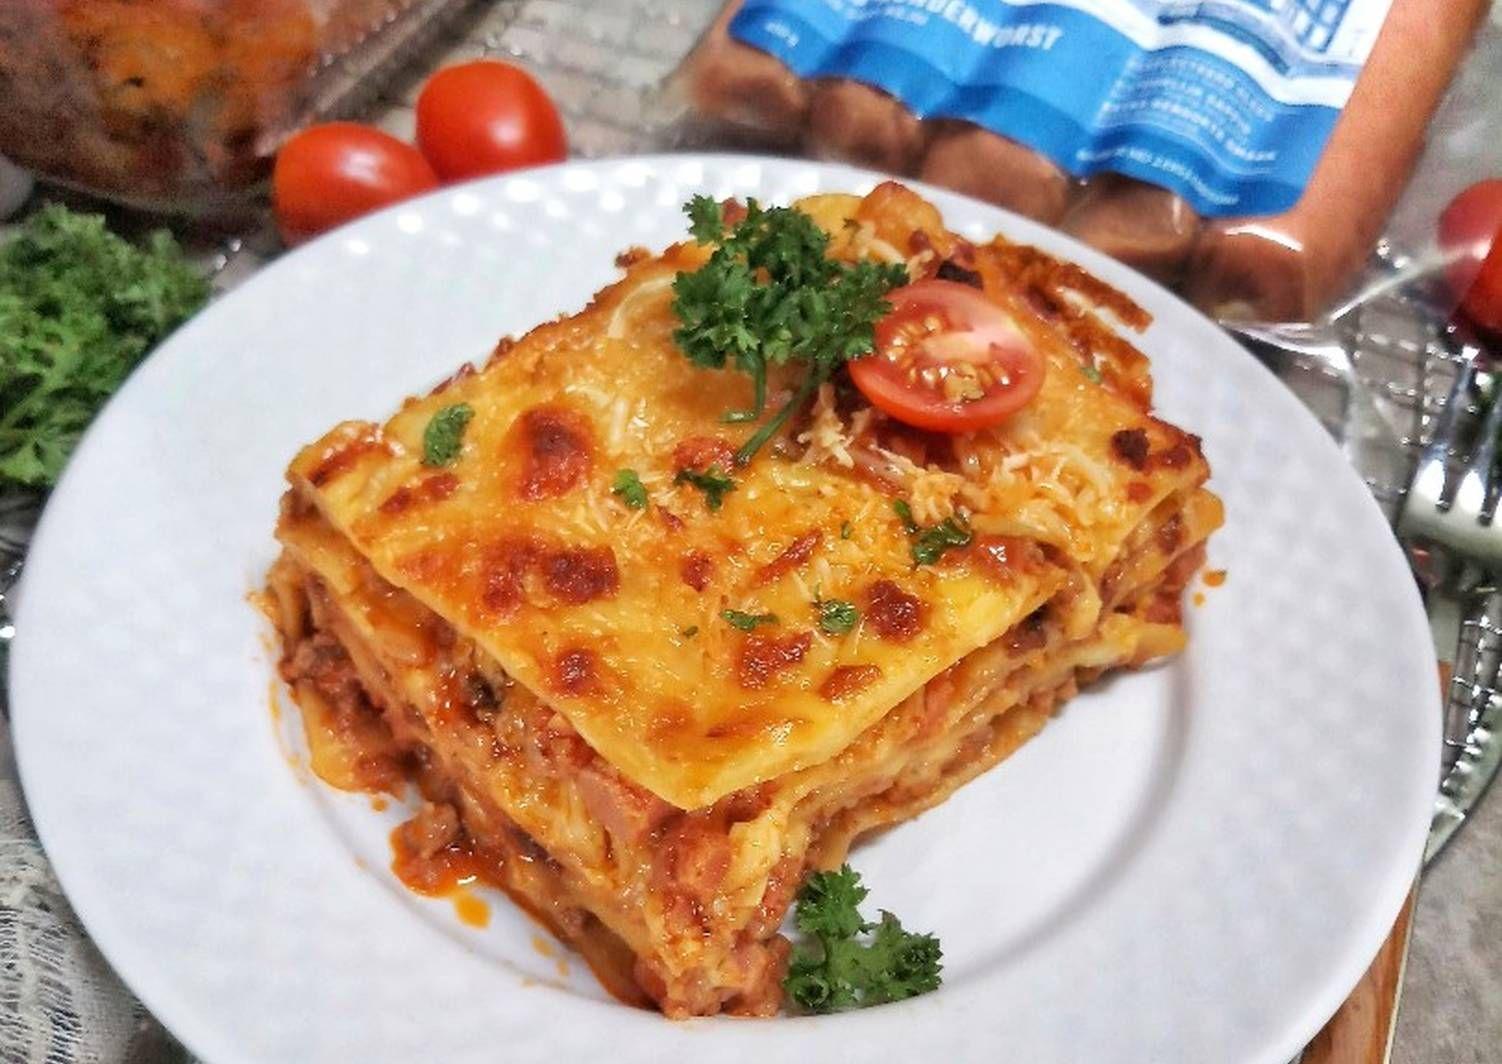 Resep Lasagna Sosis Sapi Keju Oleh Dapurvy Resep Resep Makanan Penutup Resep Lasagna